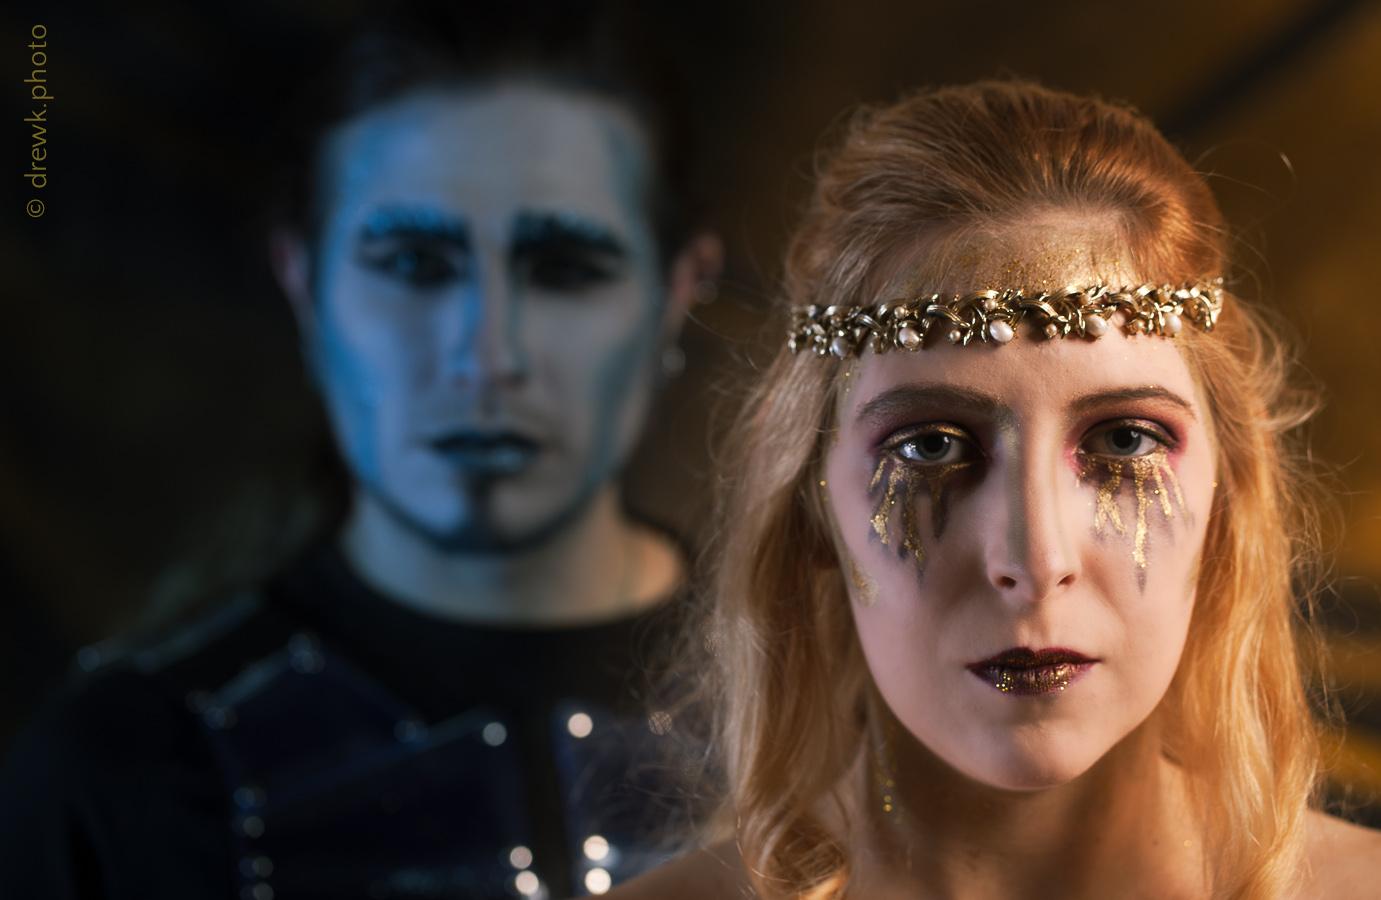 Hades and Persephone Models : Nenedhel & Count Chronos Morté<br/> Hair & Makeup Artist : Tamaris Orton